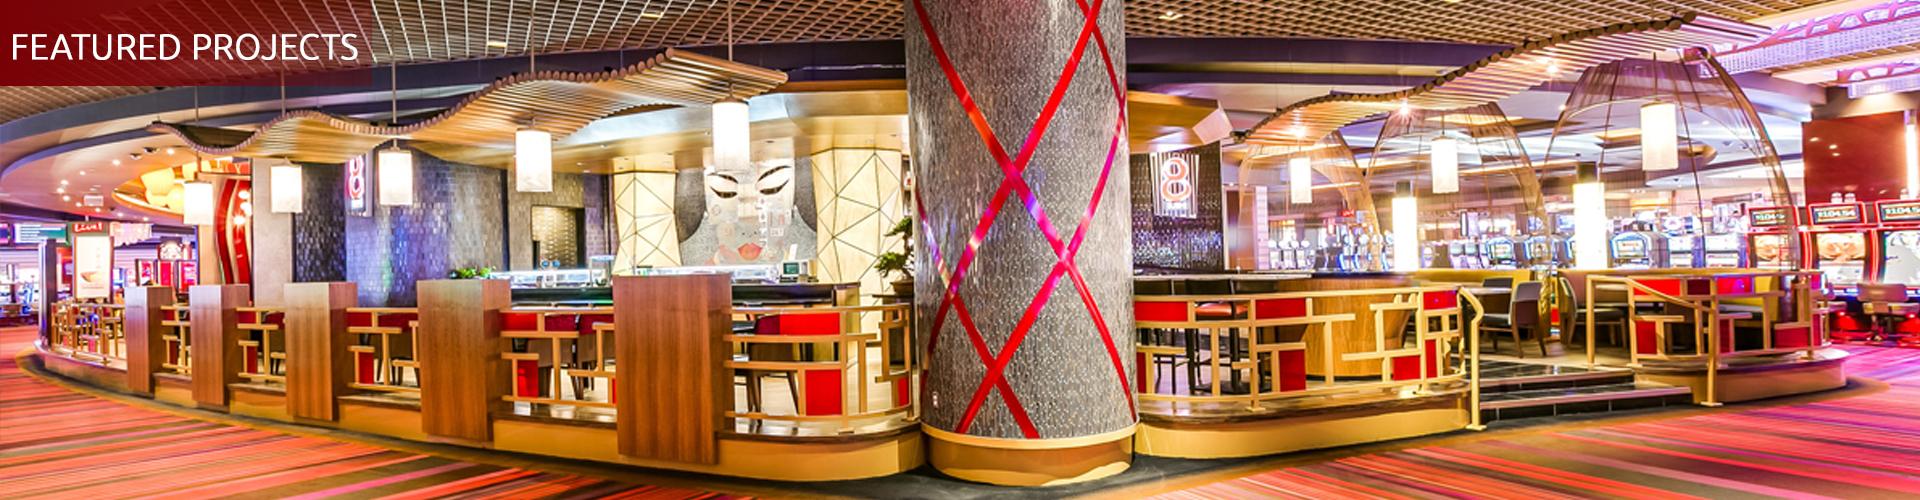 Luk Fu at Maryland Live Casino, by UrbanBuilt